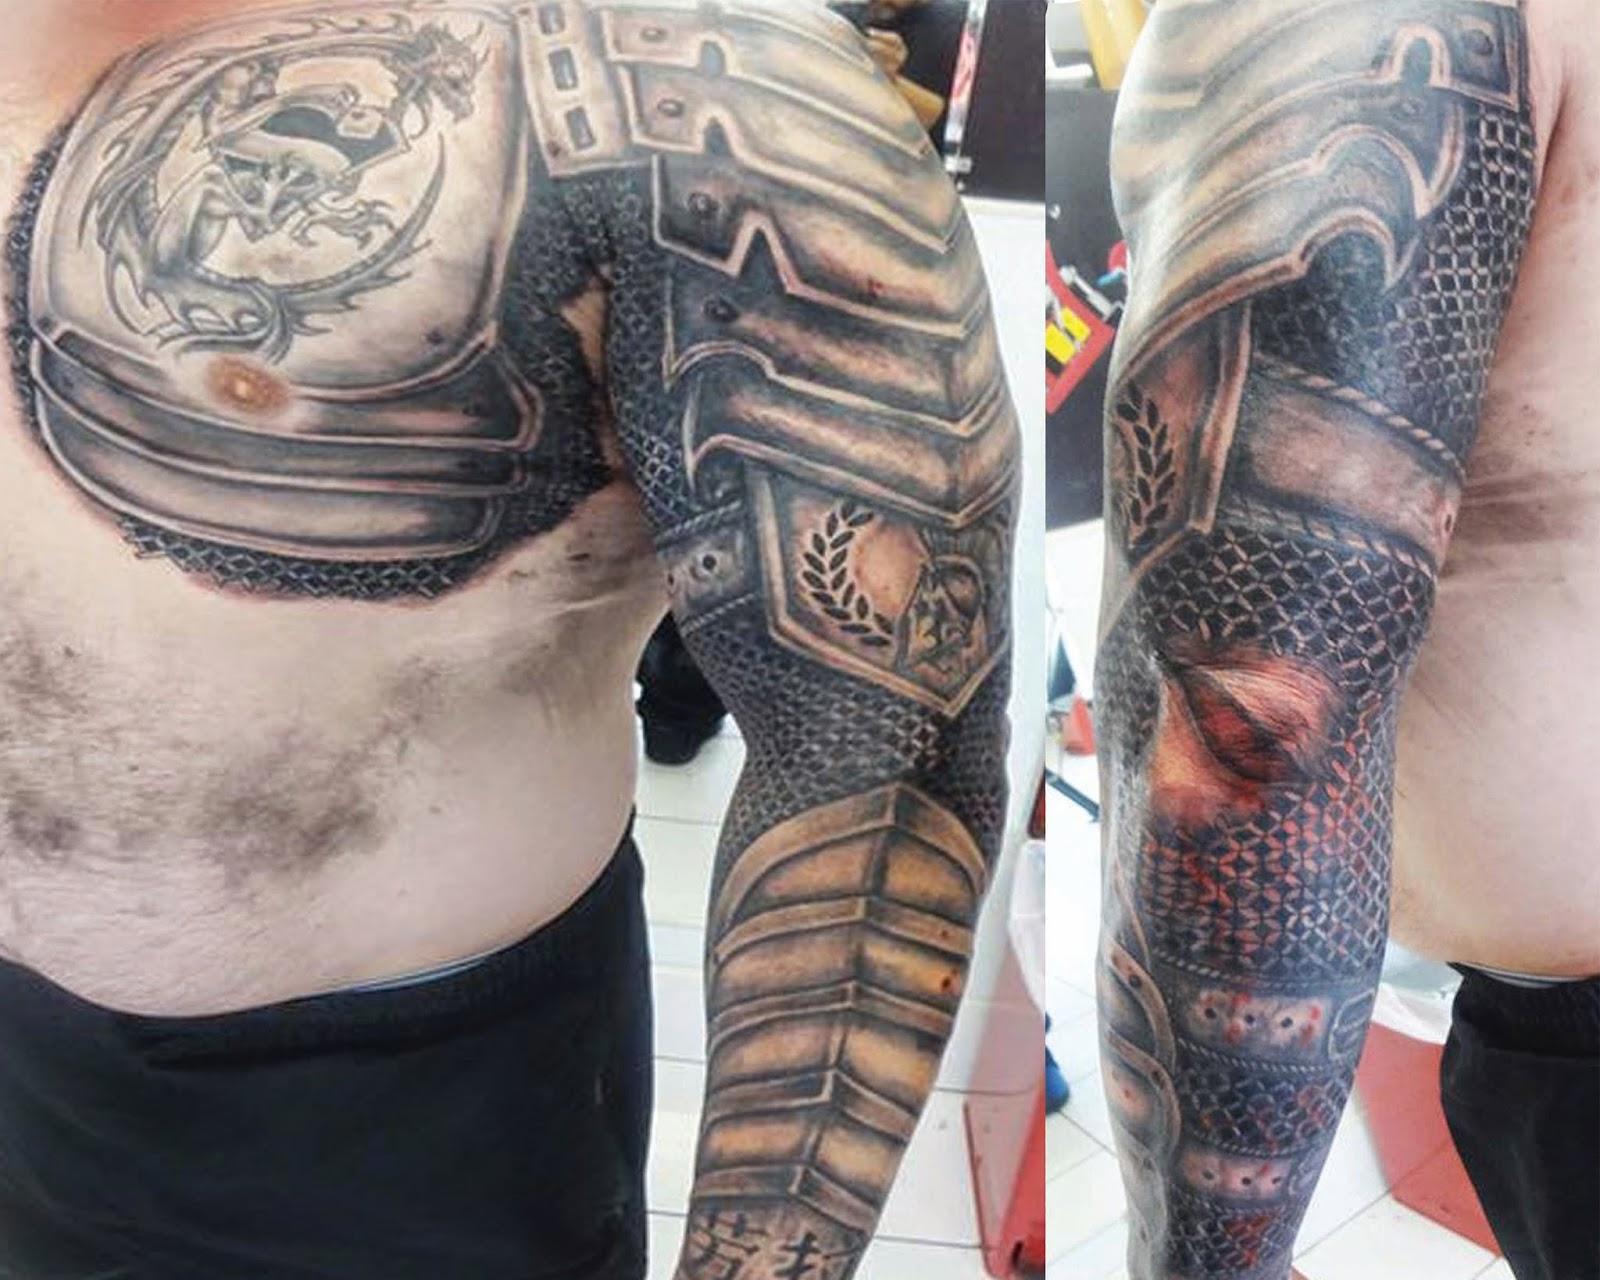 Dragon Armor Tattoos Tattoos Gallery Dragon shoulder armor tattoo for men. dragon armor tattoos tattoos gallery